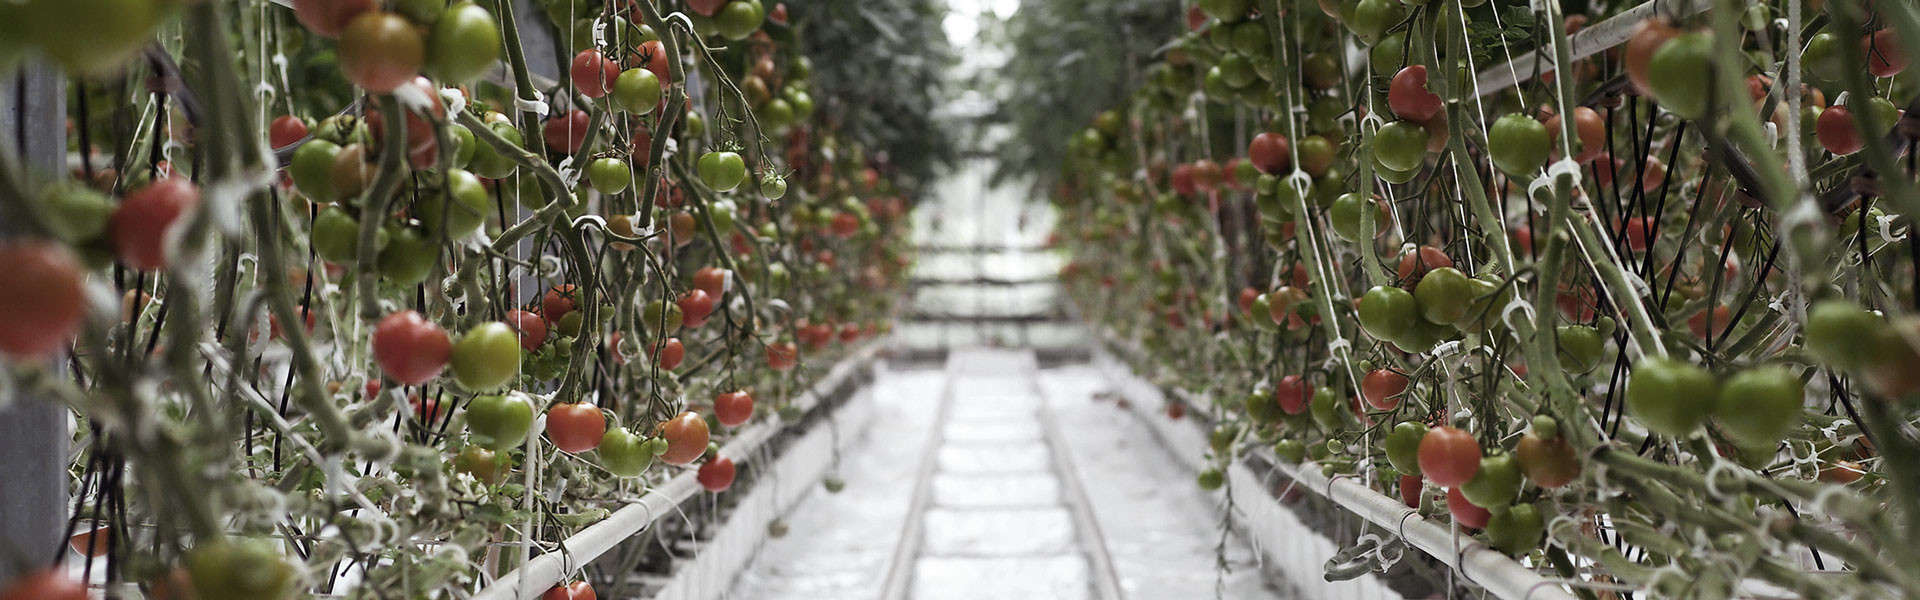 Gemüseanbau maschinen | Steenks Service